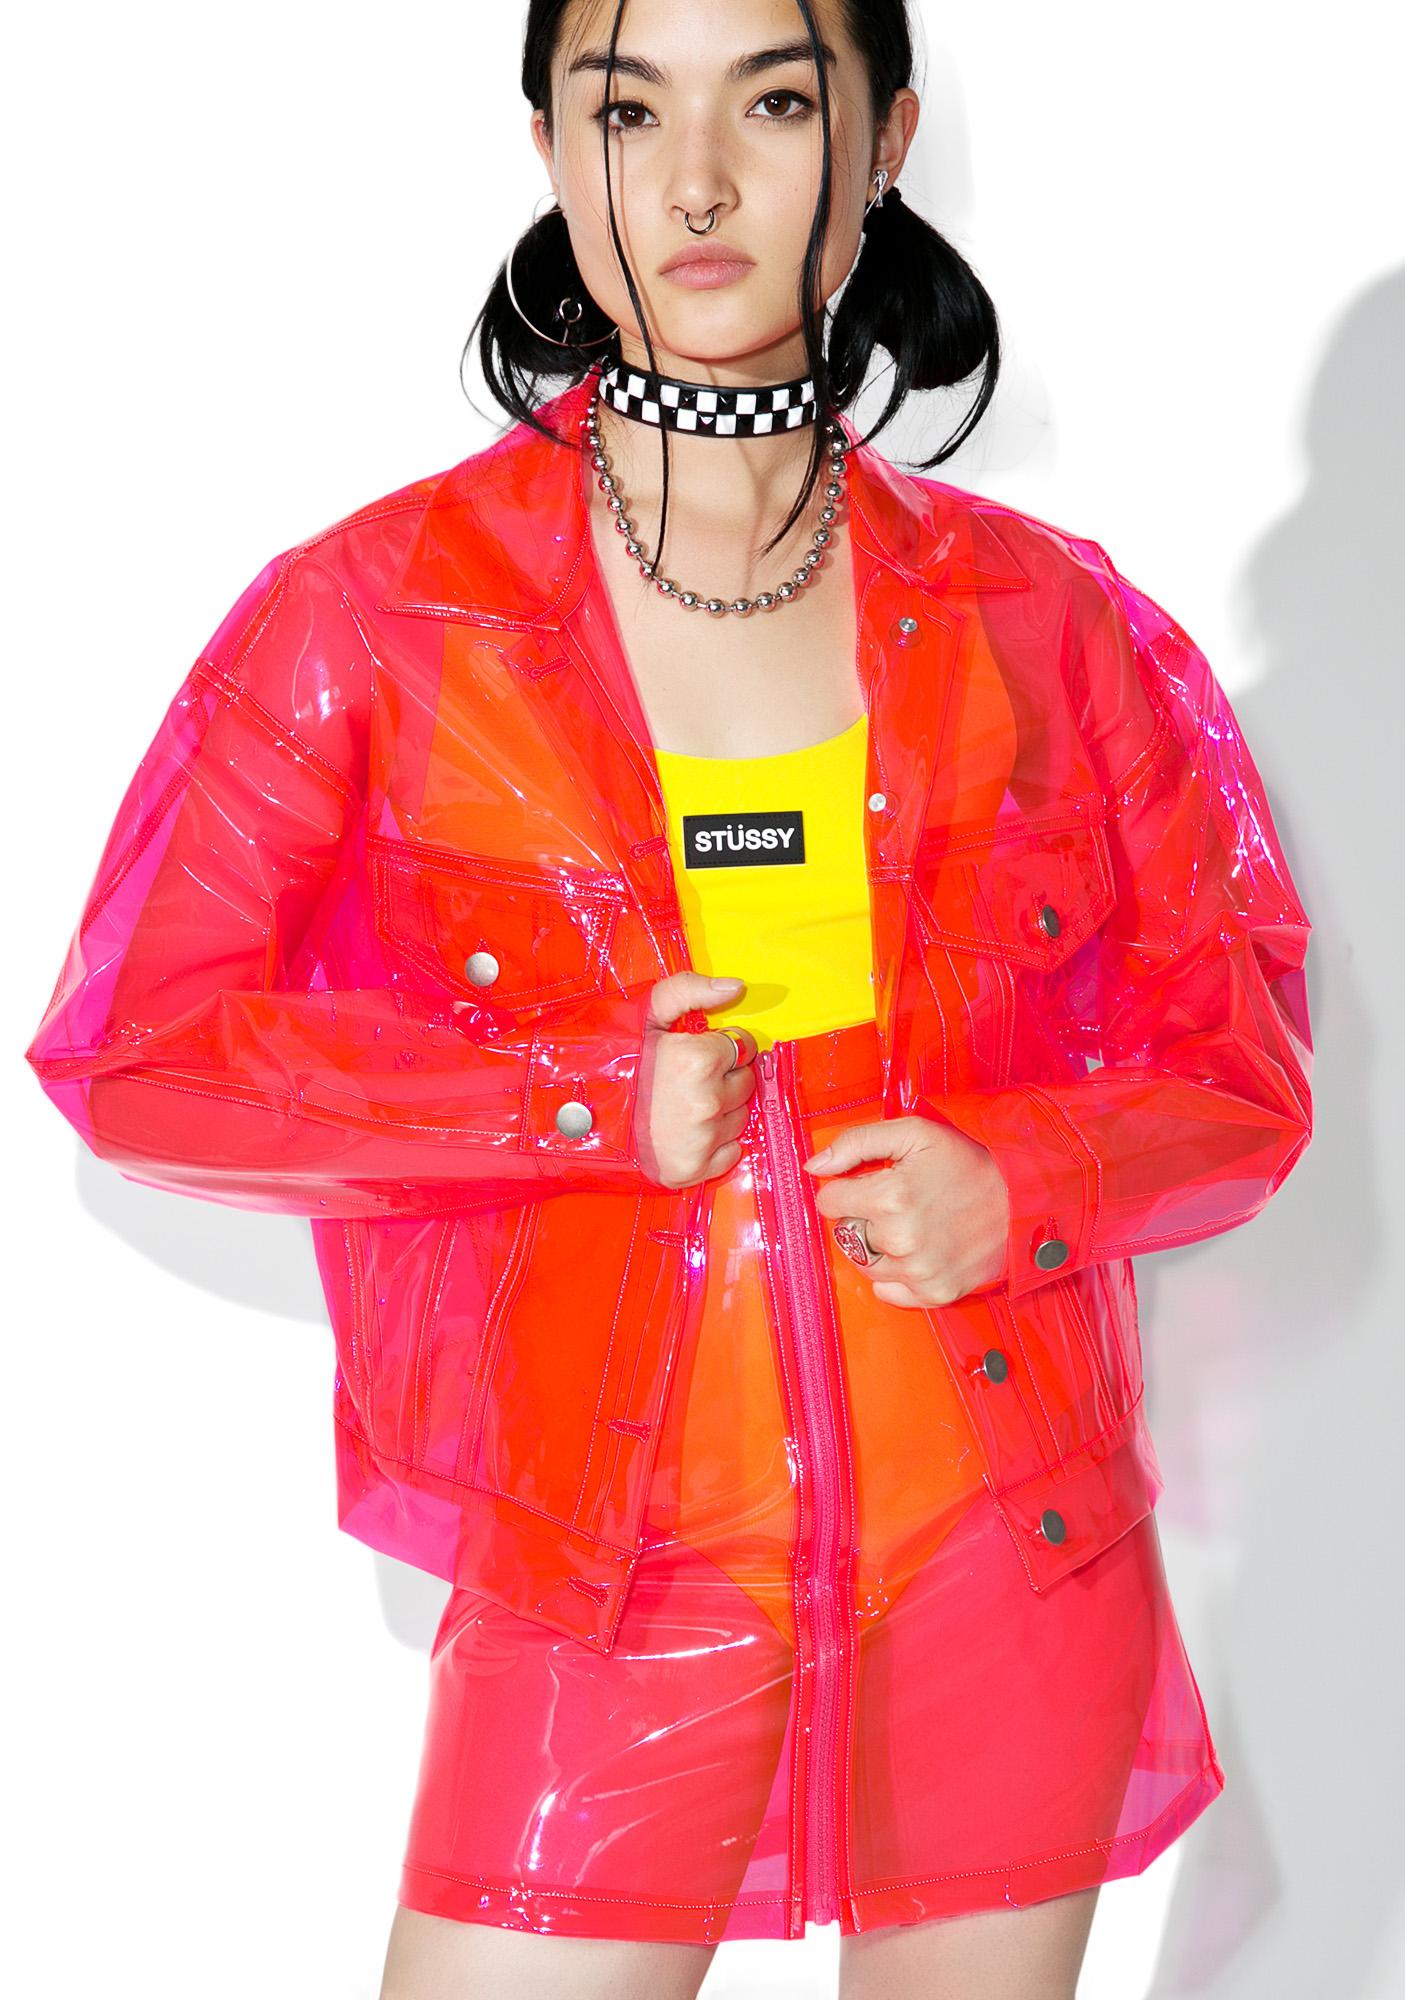 Brashy Crystalline Pink Transparent Jacket